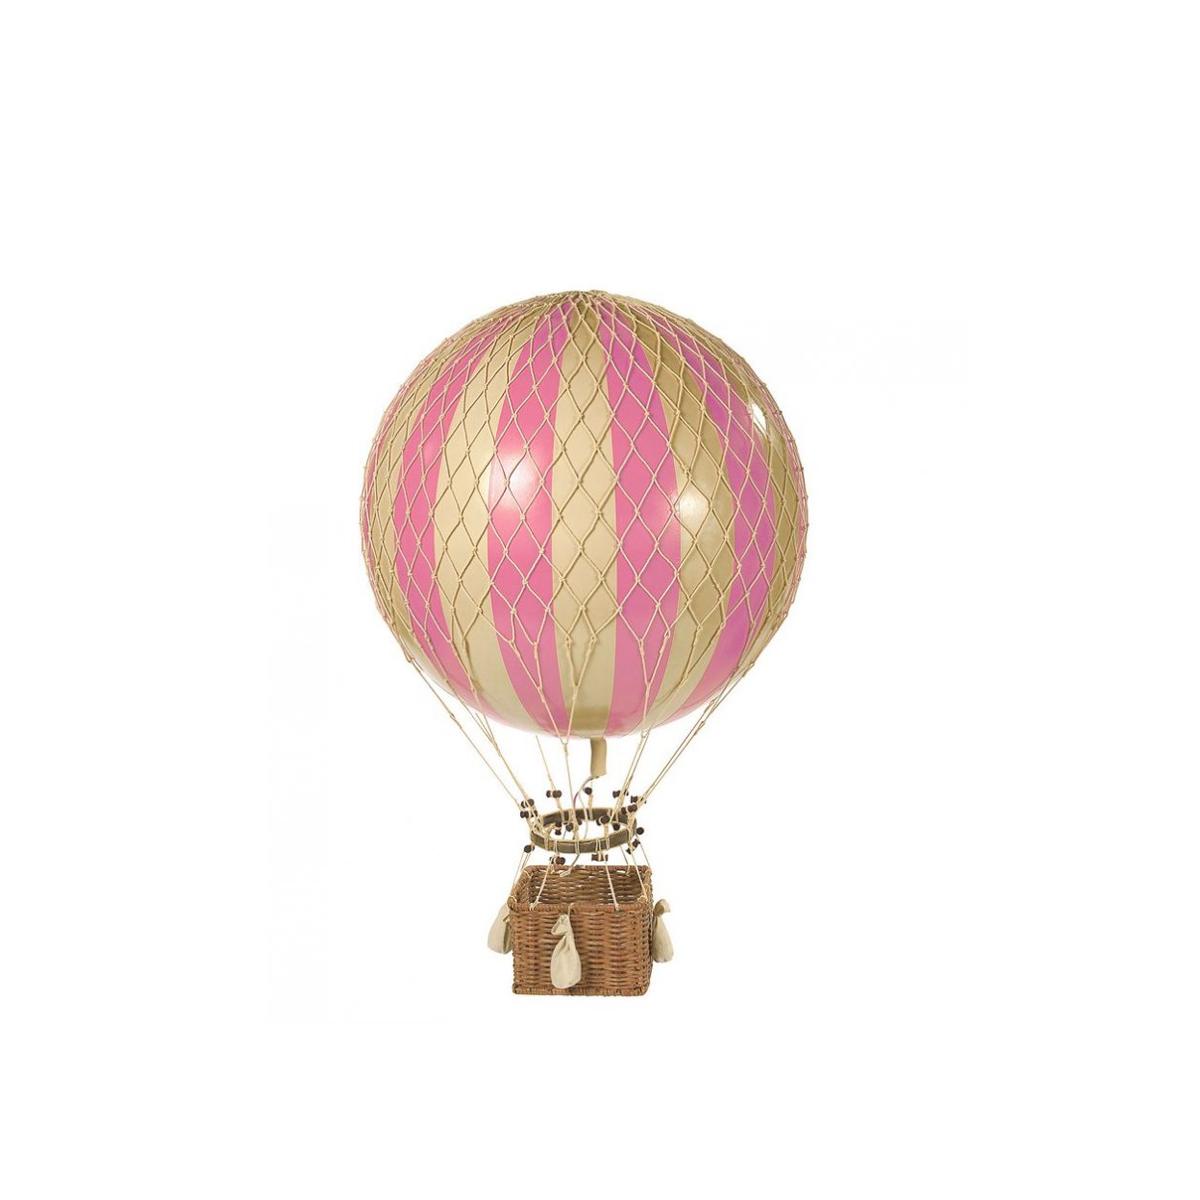 Image of Authentic Models luftballon 8,5 cm - rosa